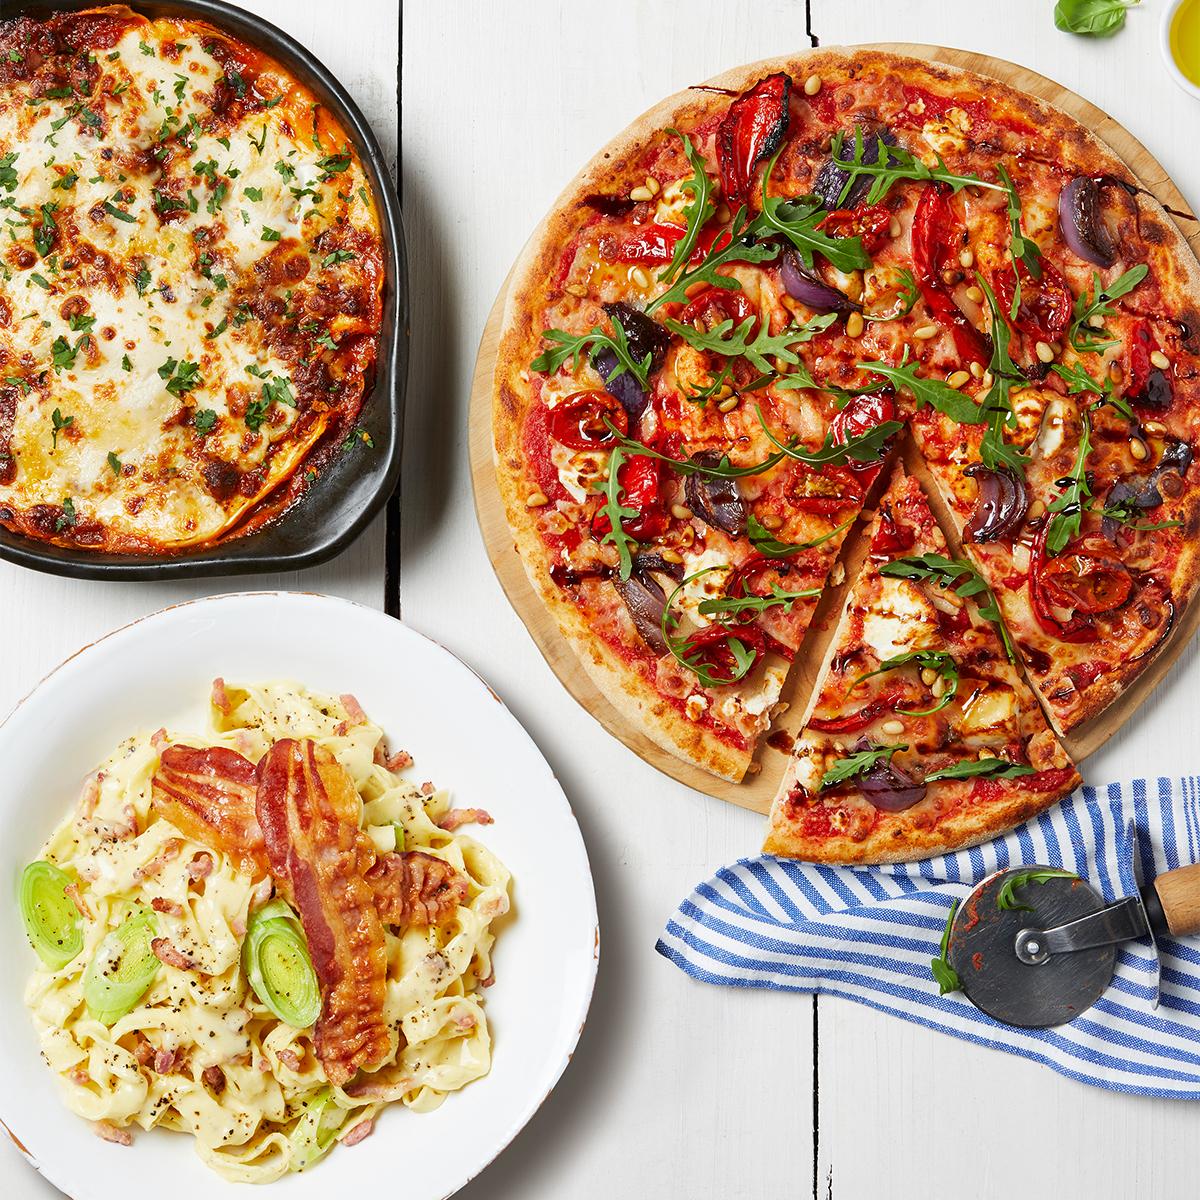 Bella Italia Dine in for £10